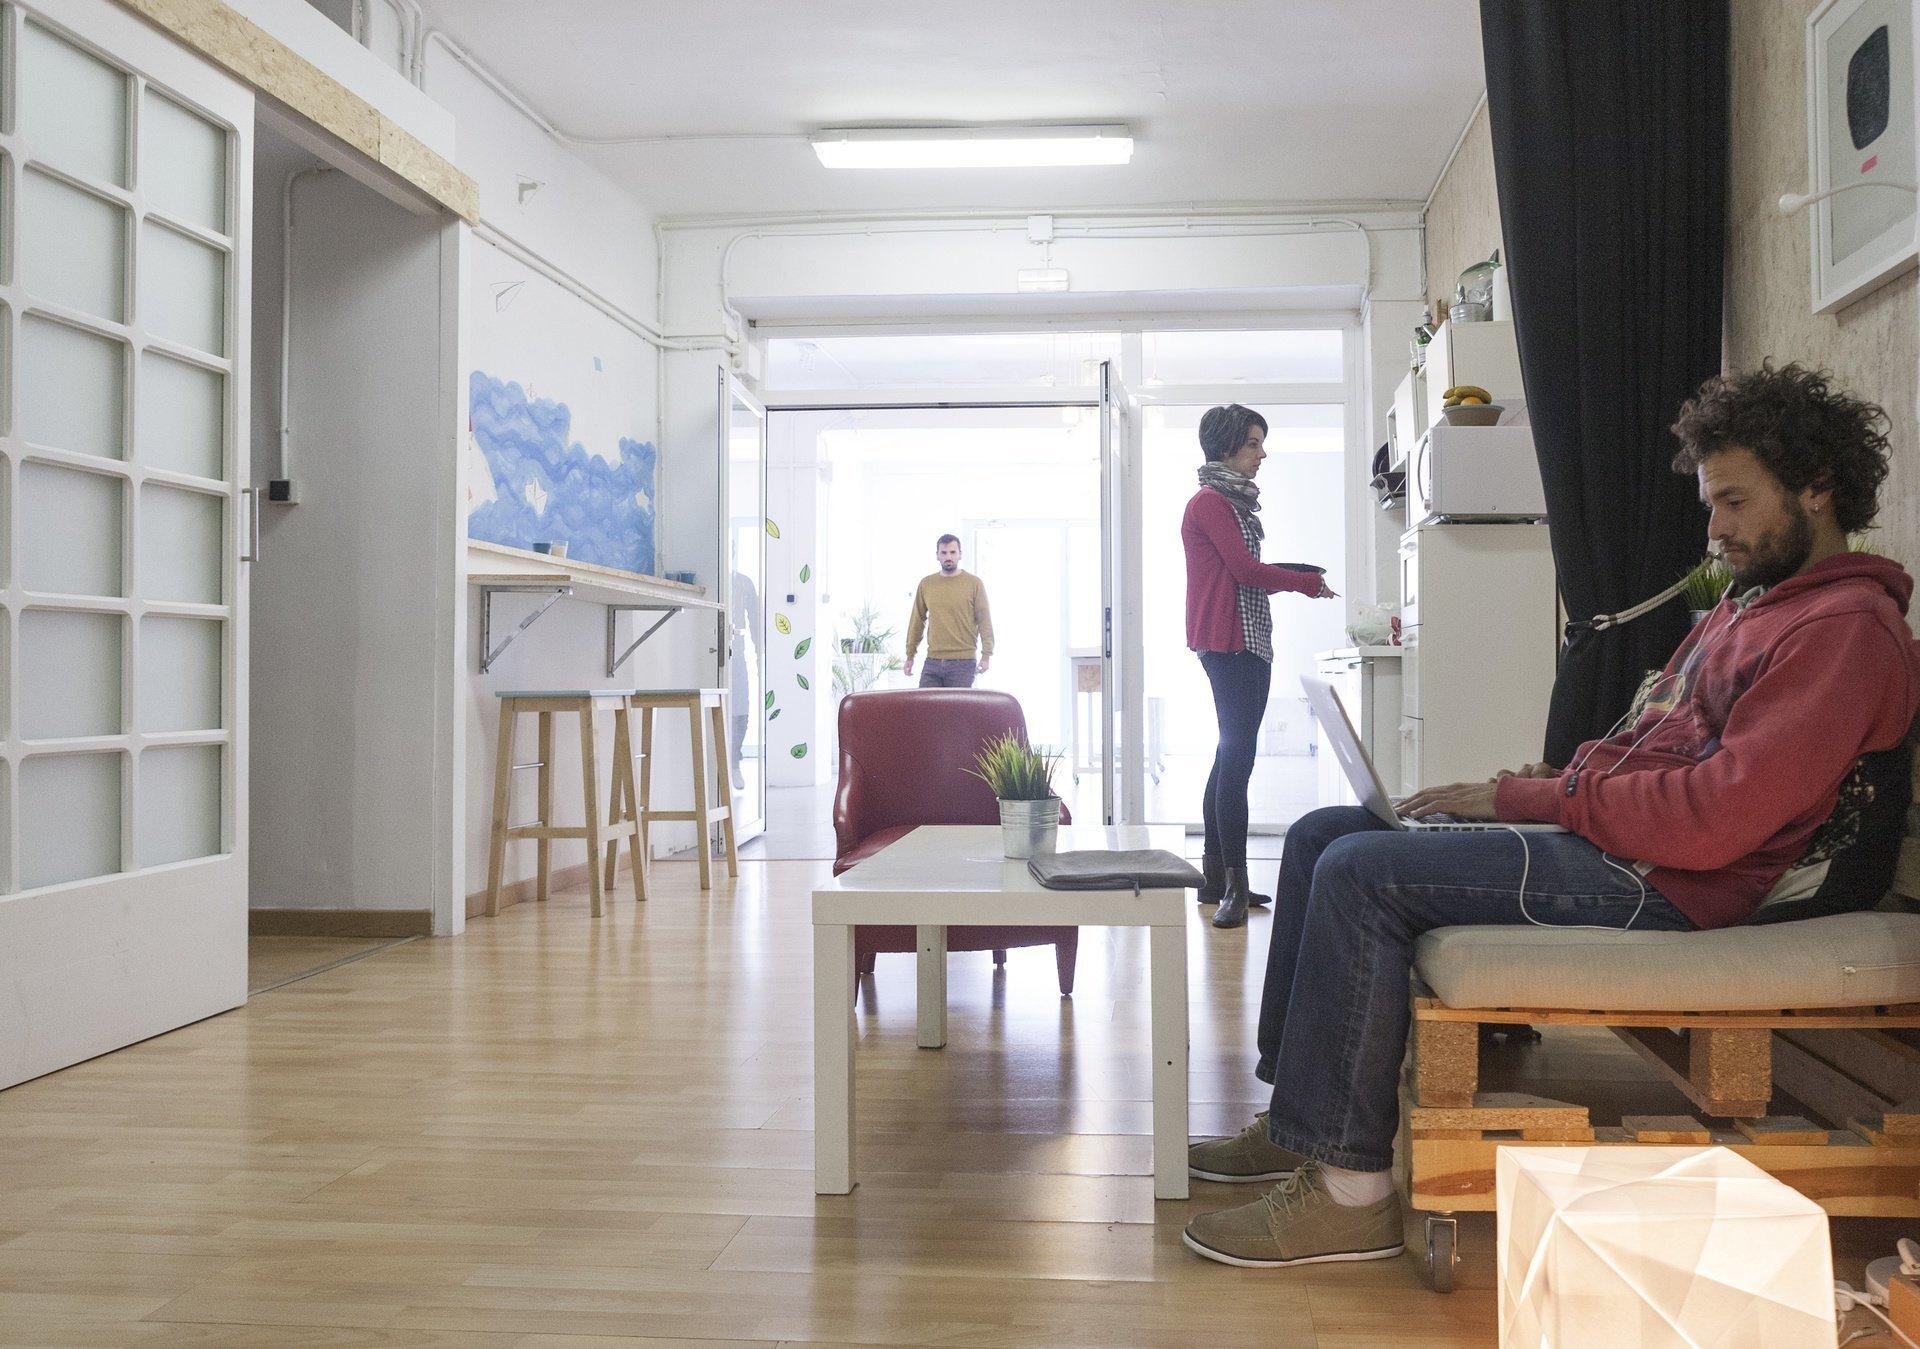 Barcelona workshop spaces Gallery Cadaver Exquisit - Large Room image 0